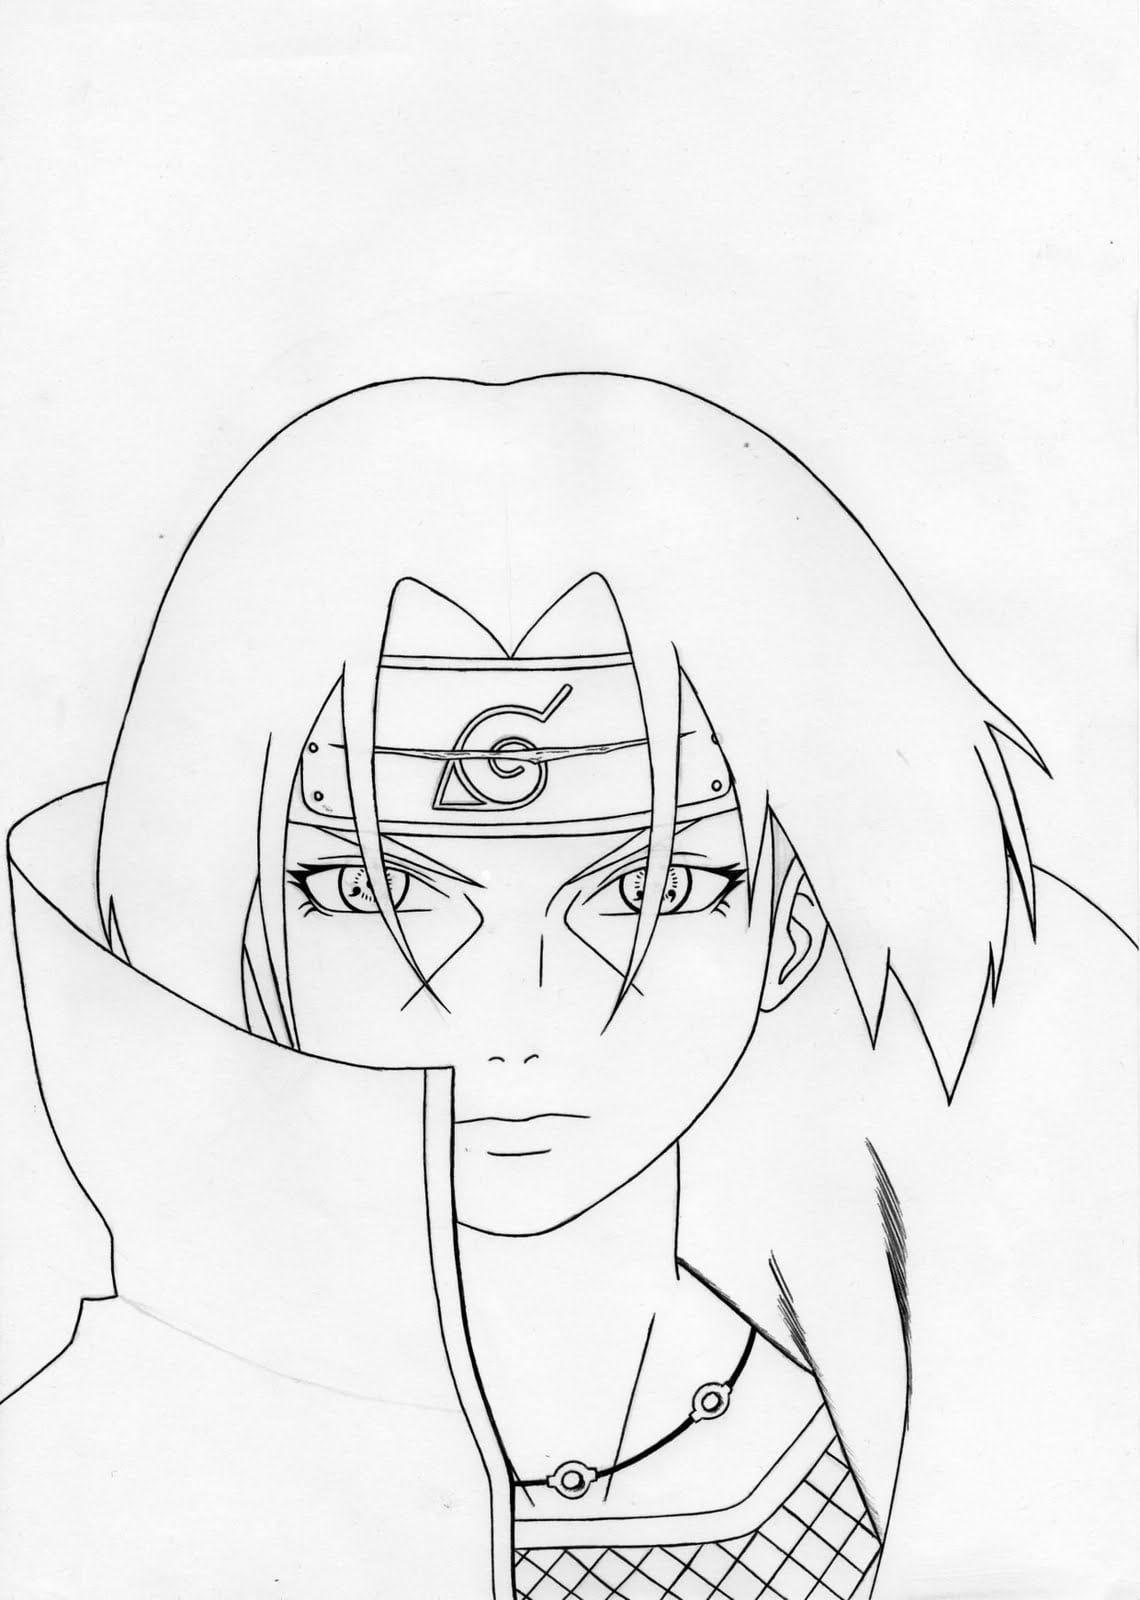 Naruto Shippuden Para Desenhar Avara C Desenhos Para Colorir